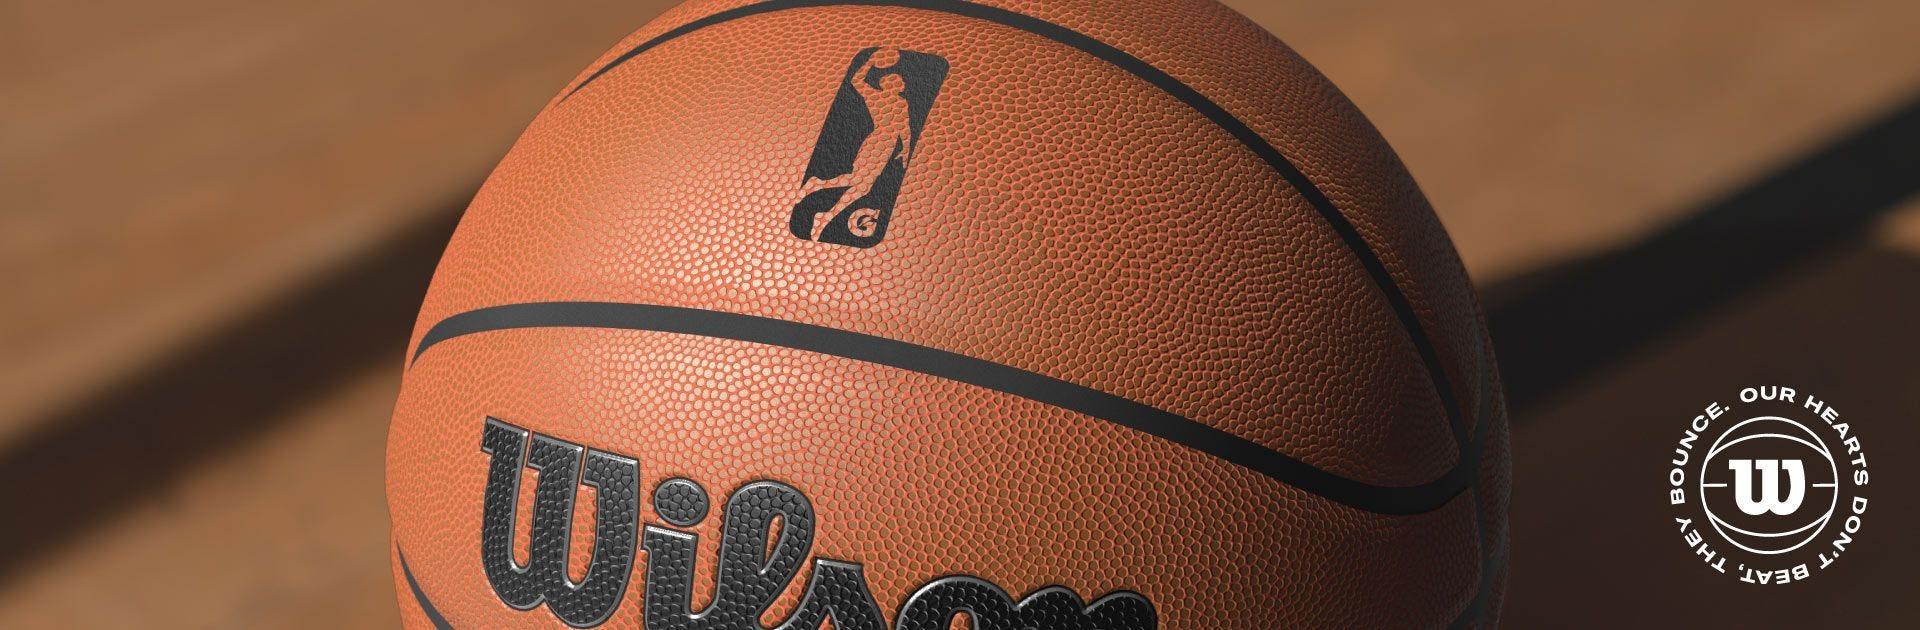 Close up of g-league basketball